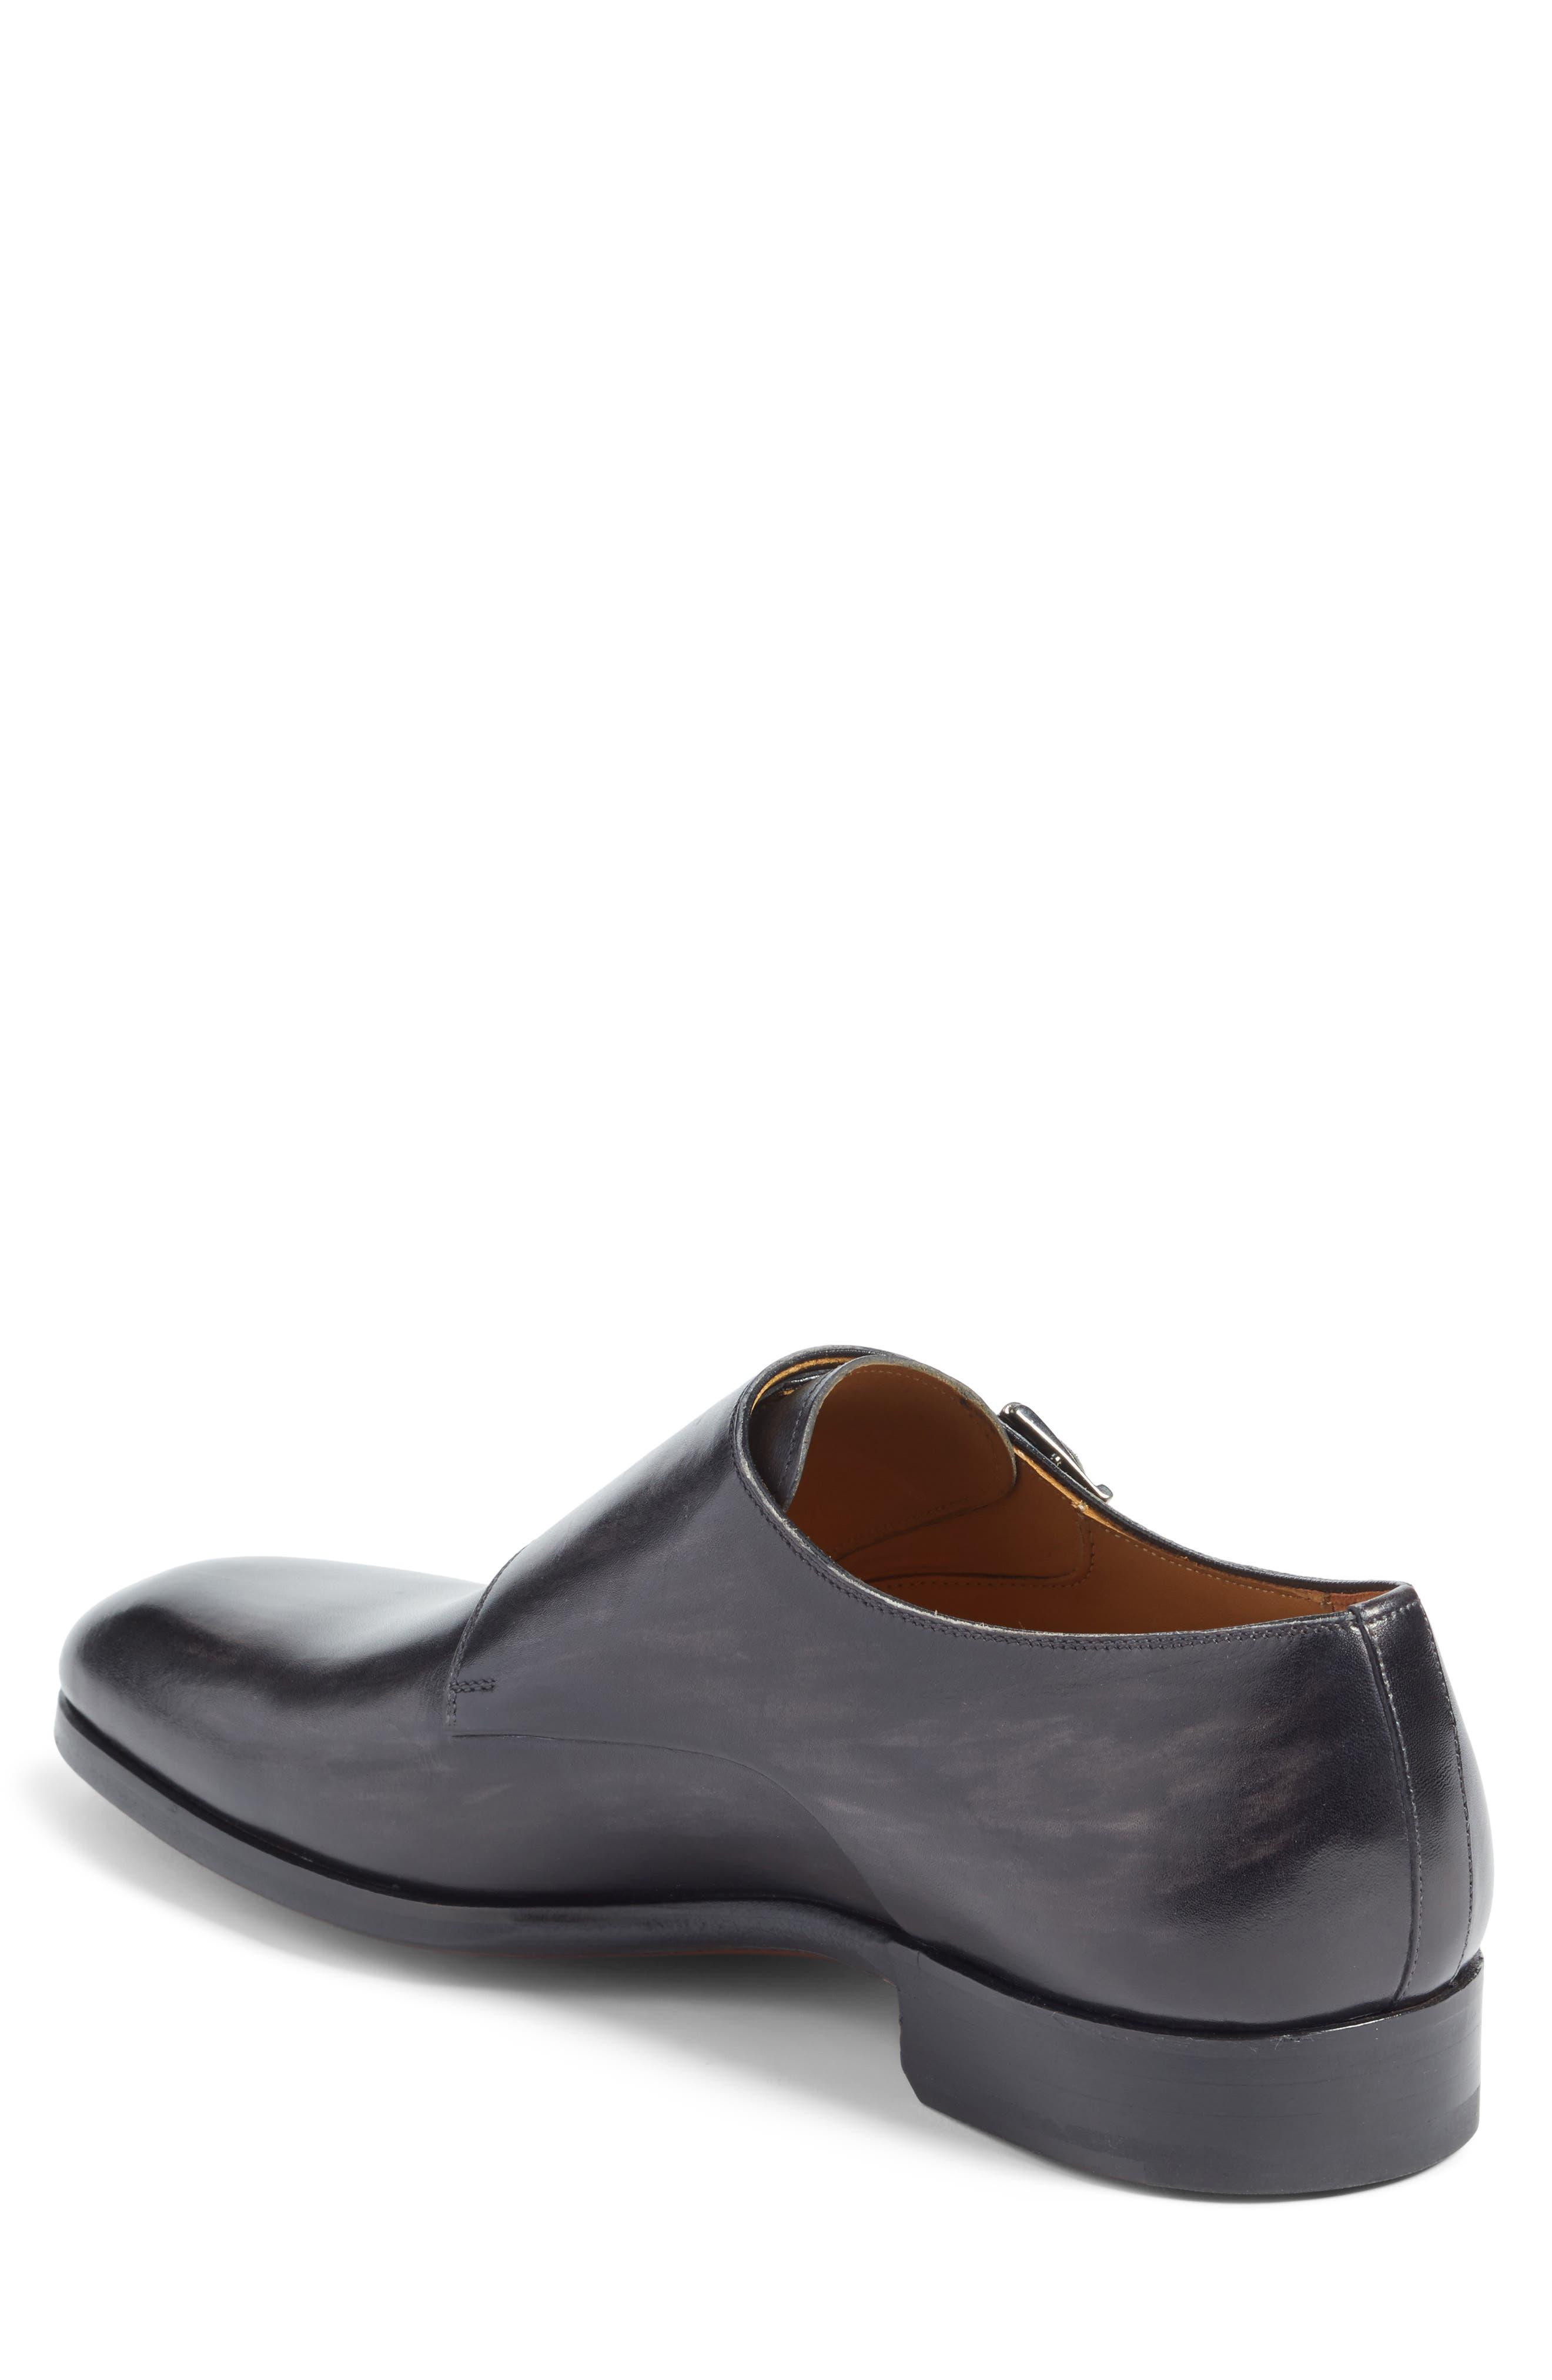 Lucio Double Strap Monk Shoe,                             Alternate thumbnail 2, color,                             Light Grey Leather